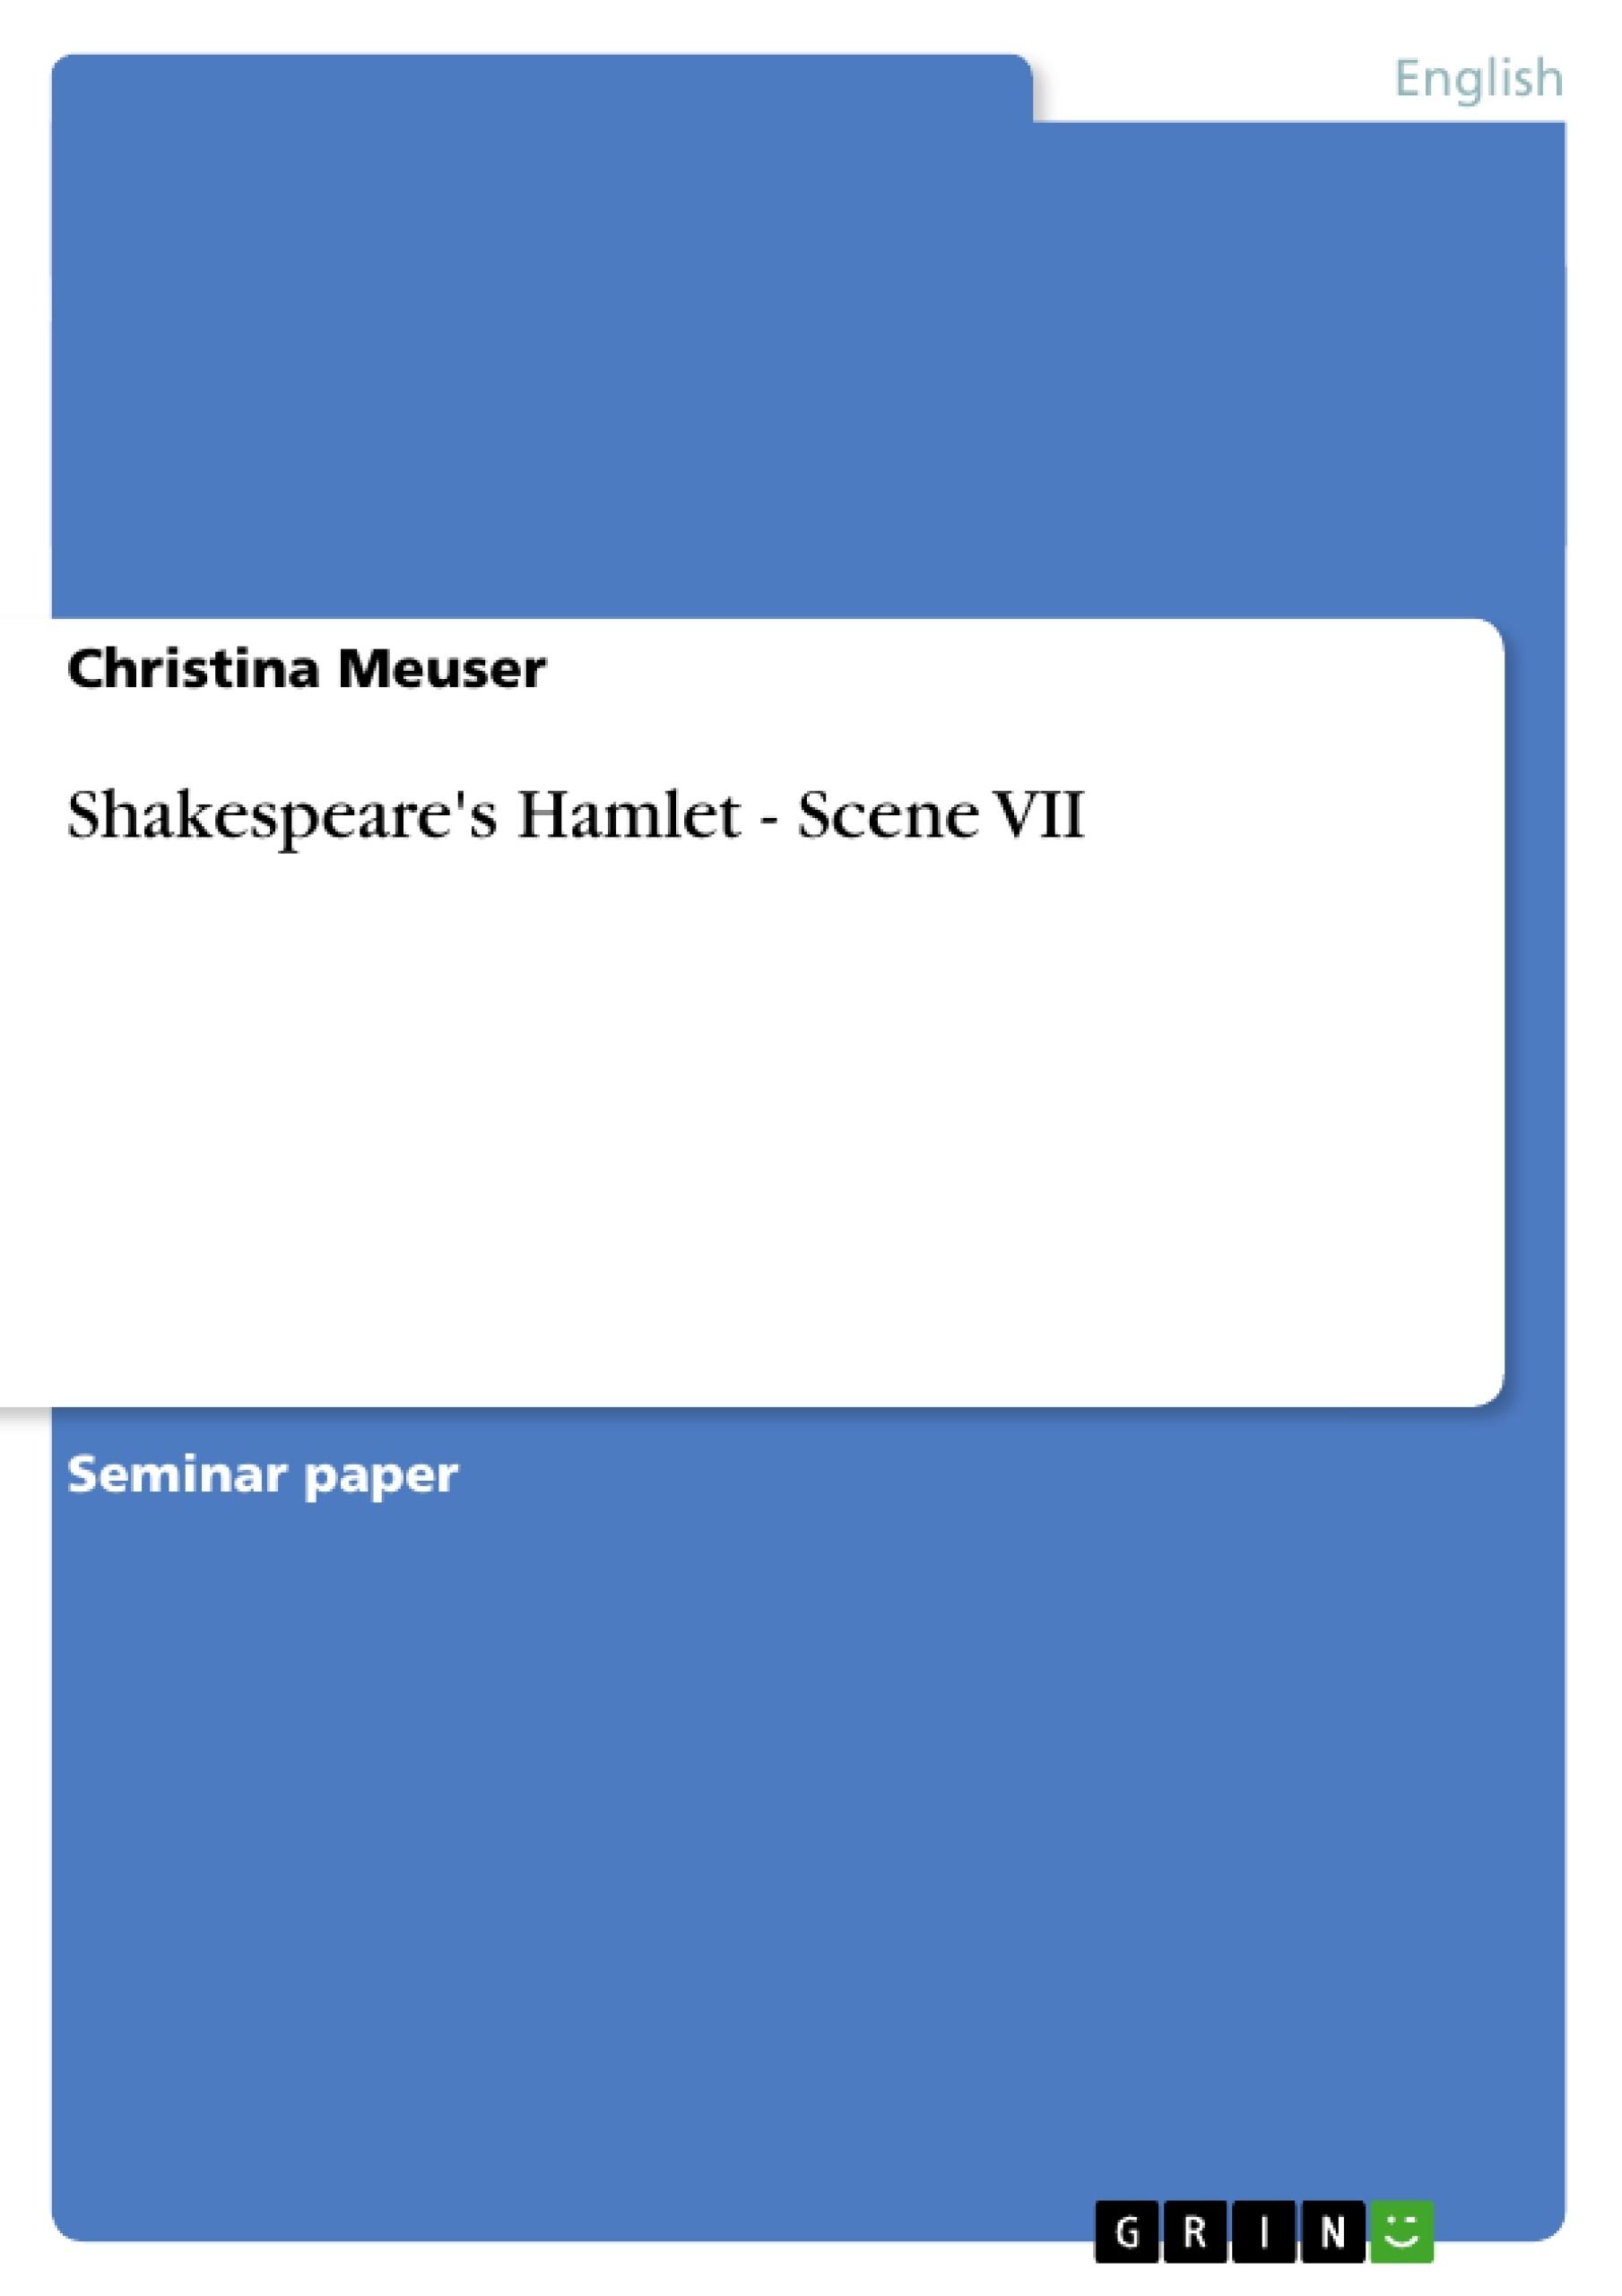 Title: Shakespeare's Hamlet - Scene VII